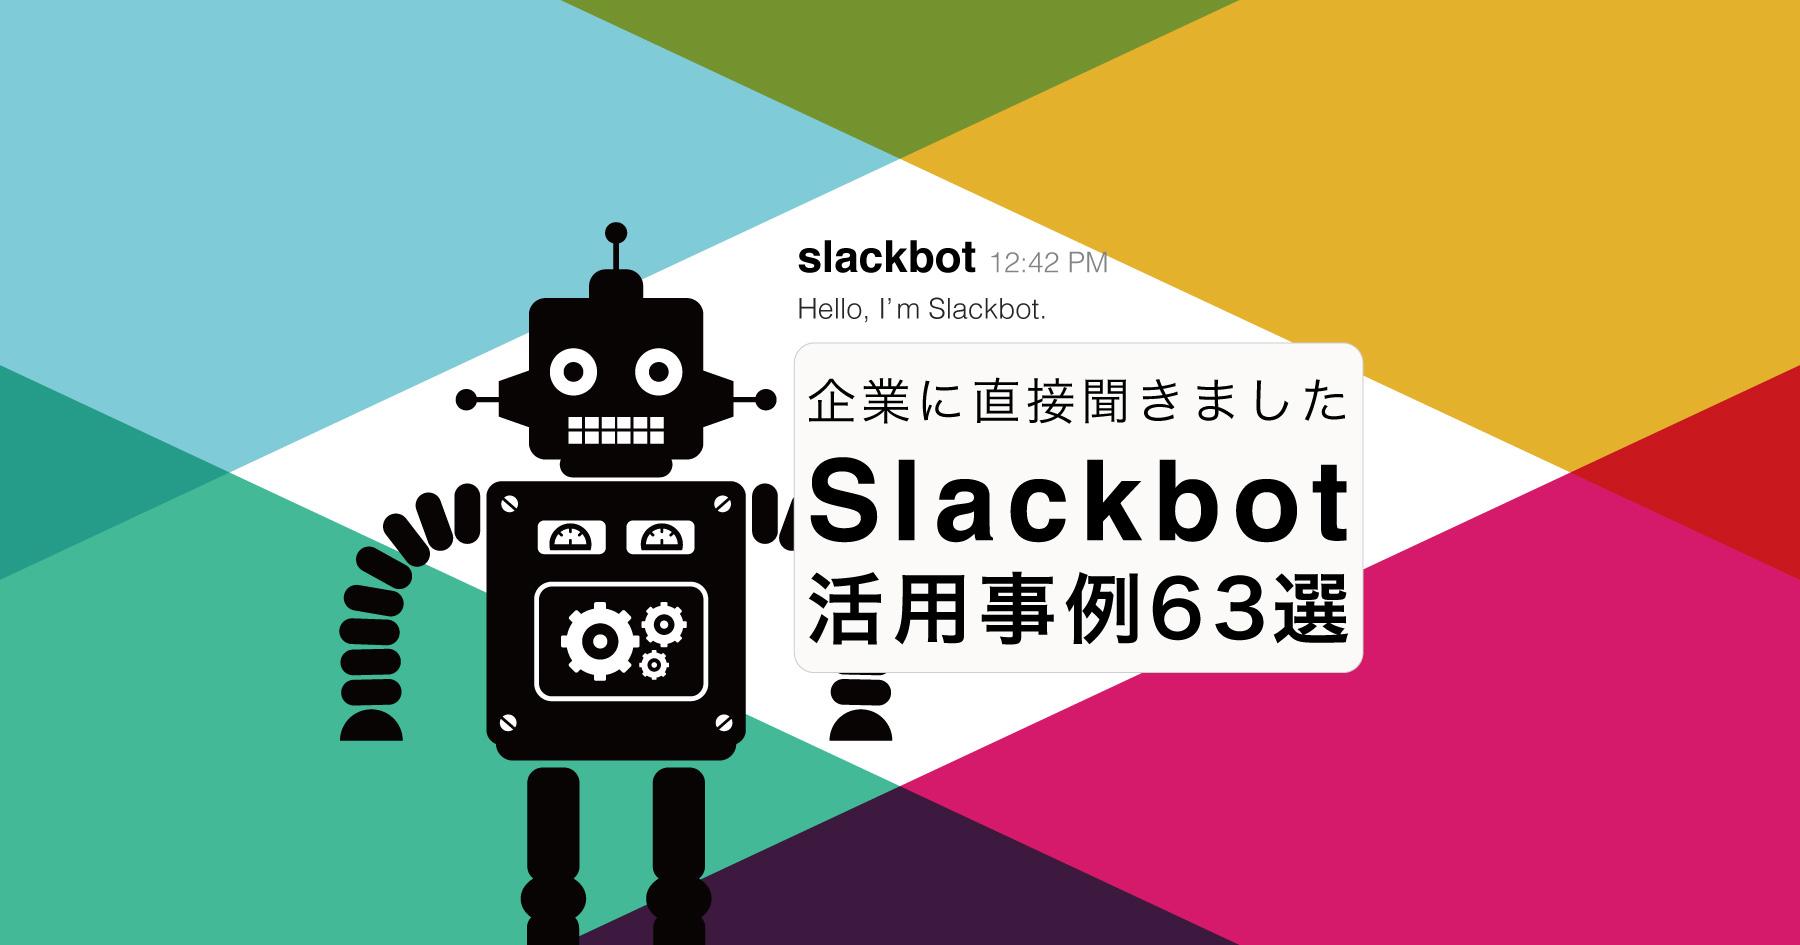 slackbot大全 63種類の事例 ツールをまとめて紹介 botを活用して